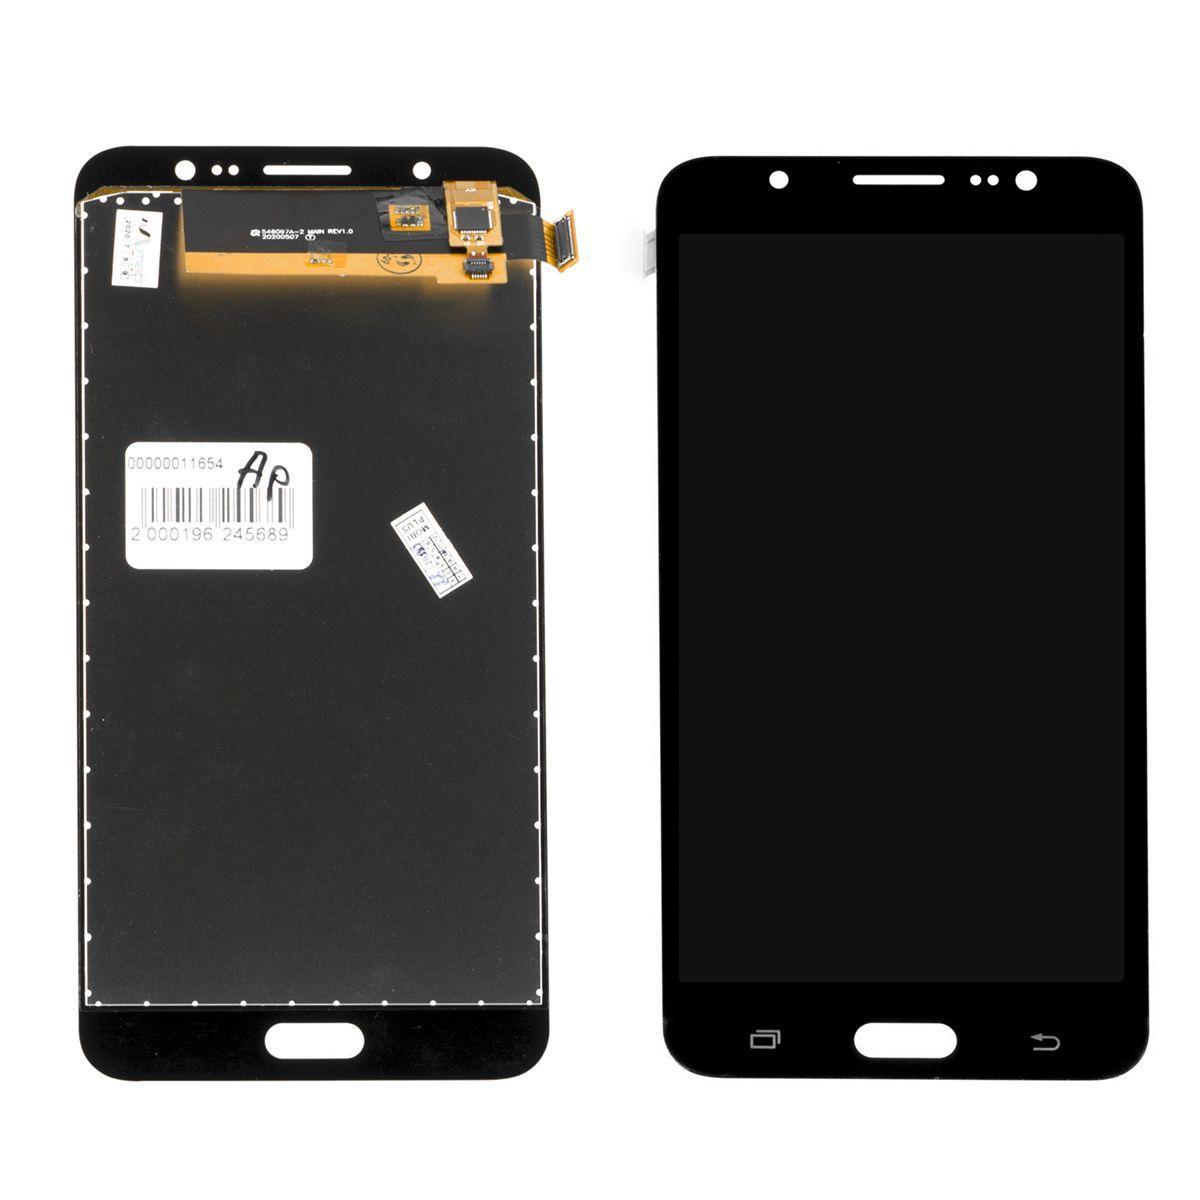 Дисплей Samsung Galaxy J7 J710 (2016) в сборе TFT Black (65)